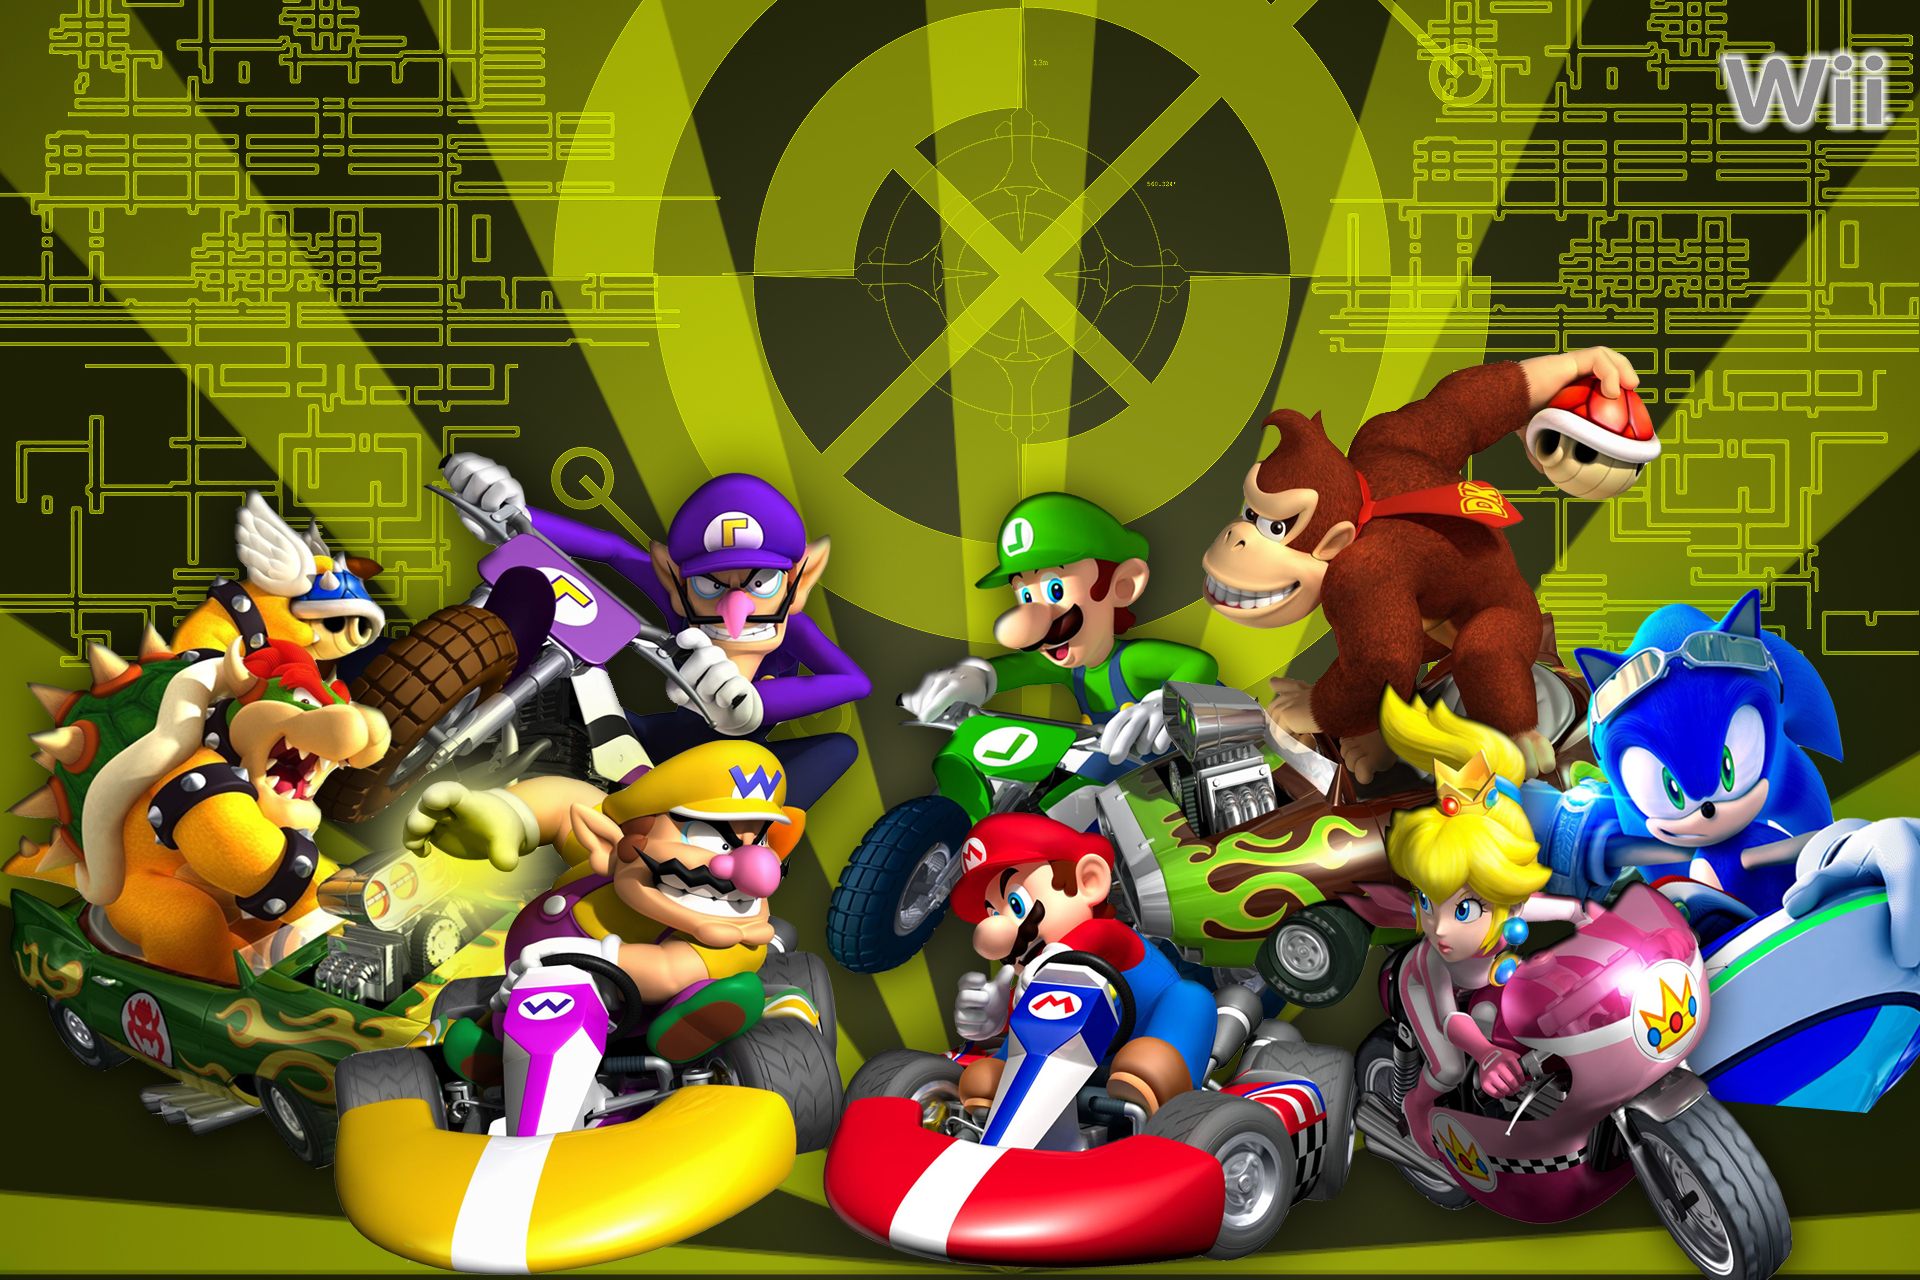 Mario Kart & Mario 3DS Dated